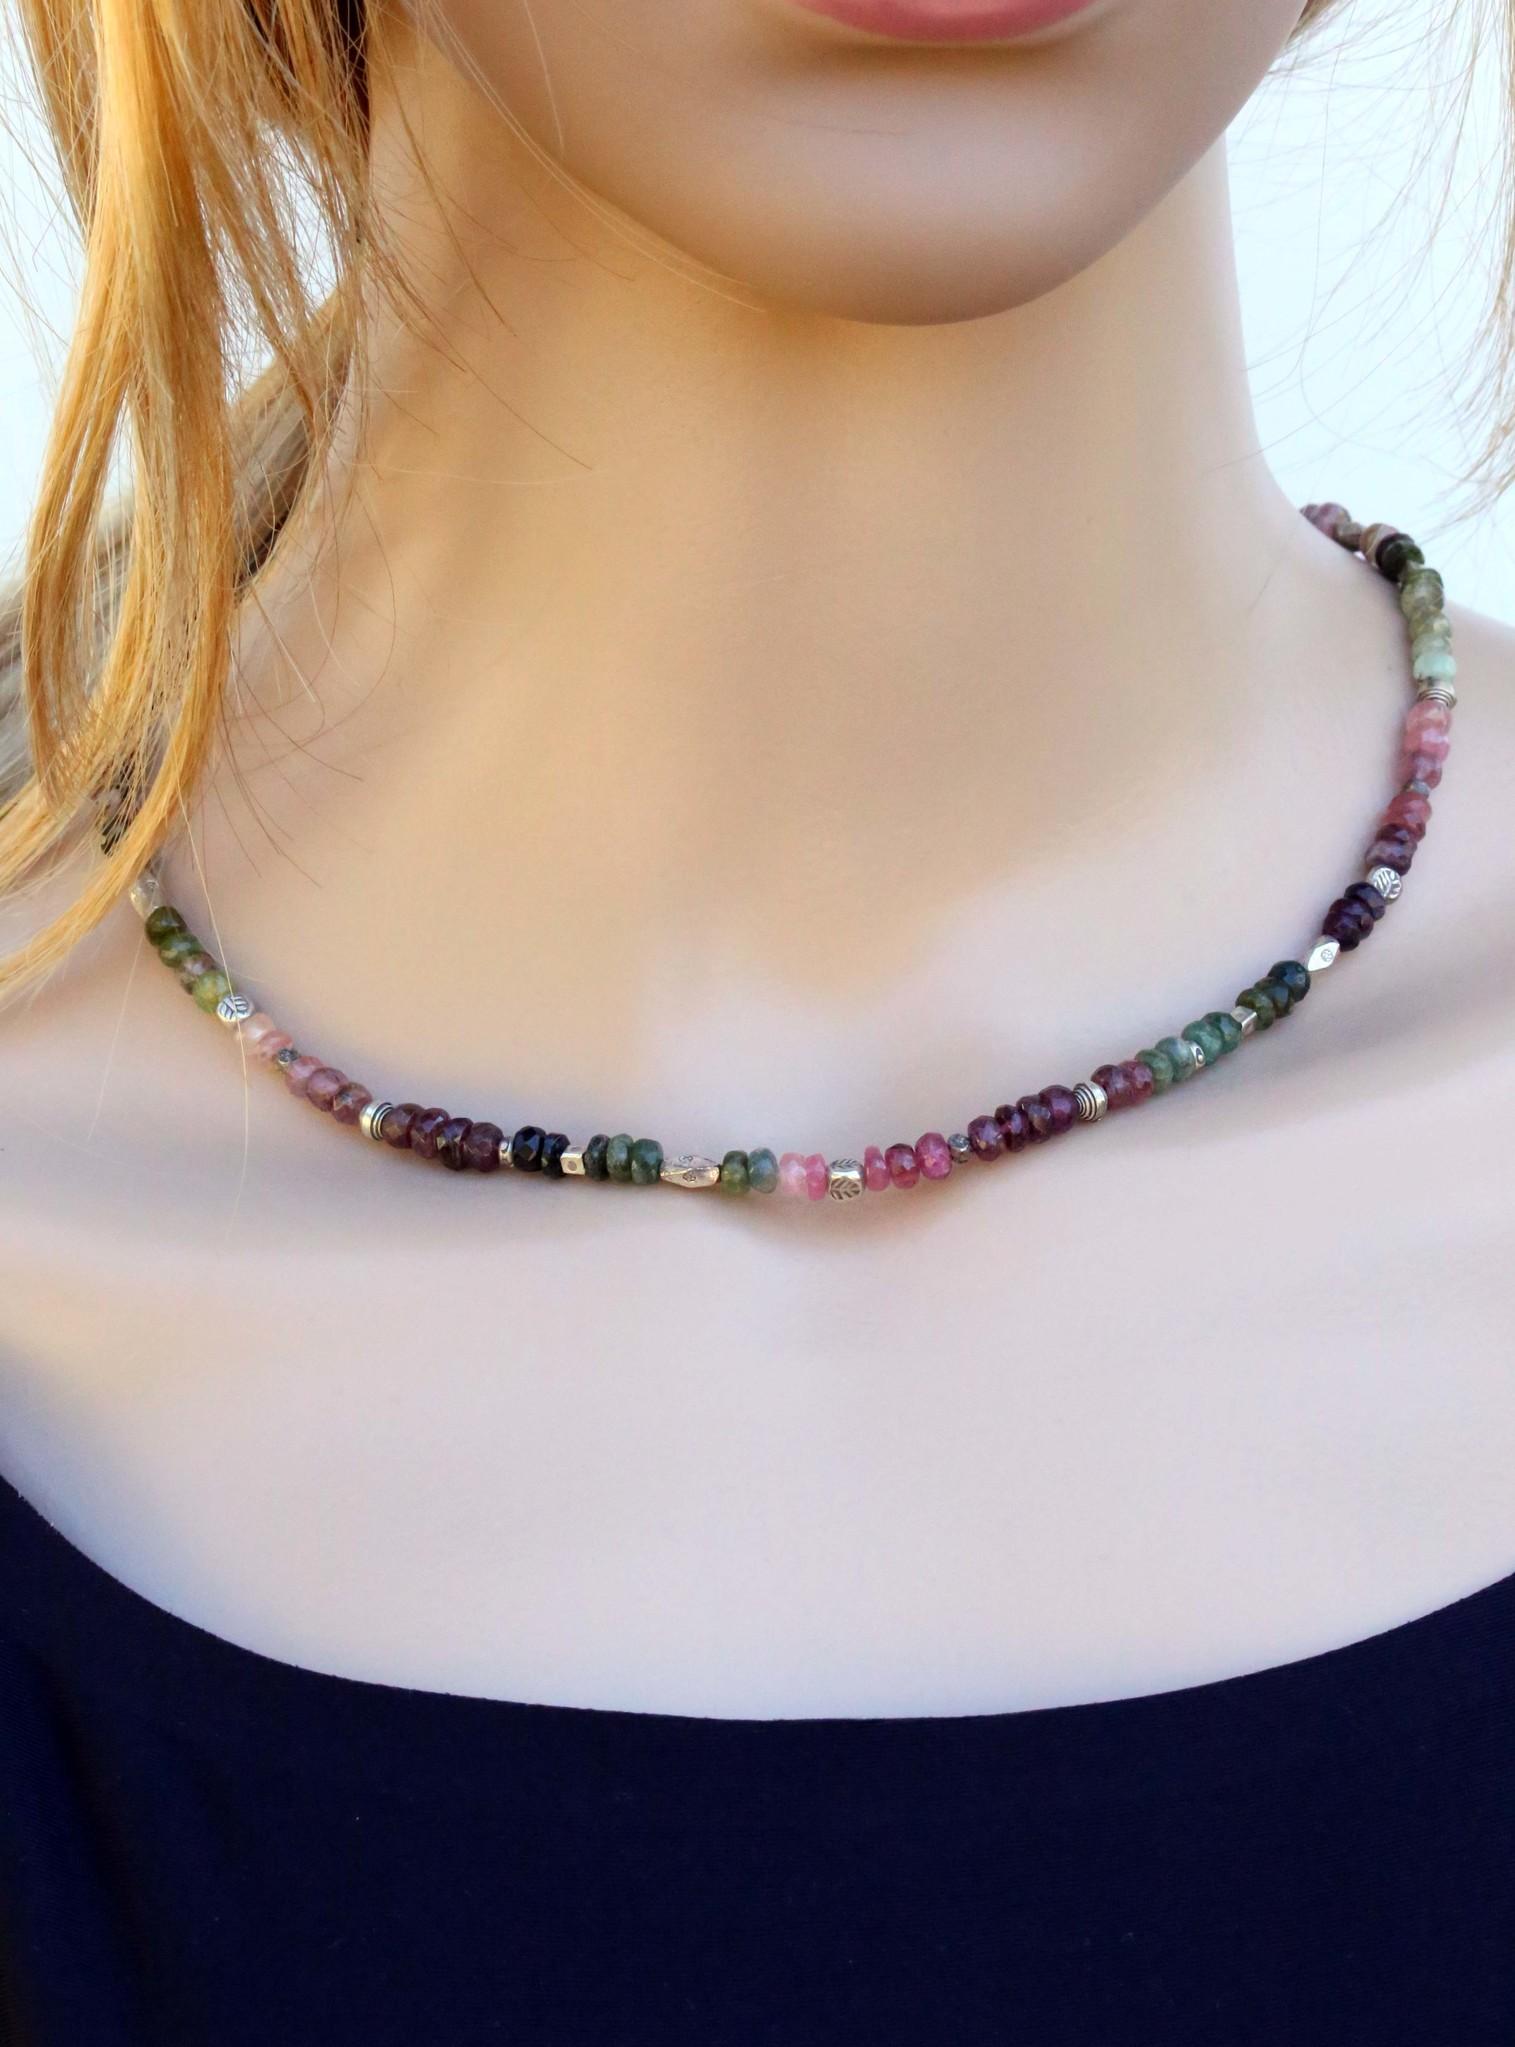 Halskette Turmalin multicolor facettiert mit Silberelementen